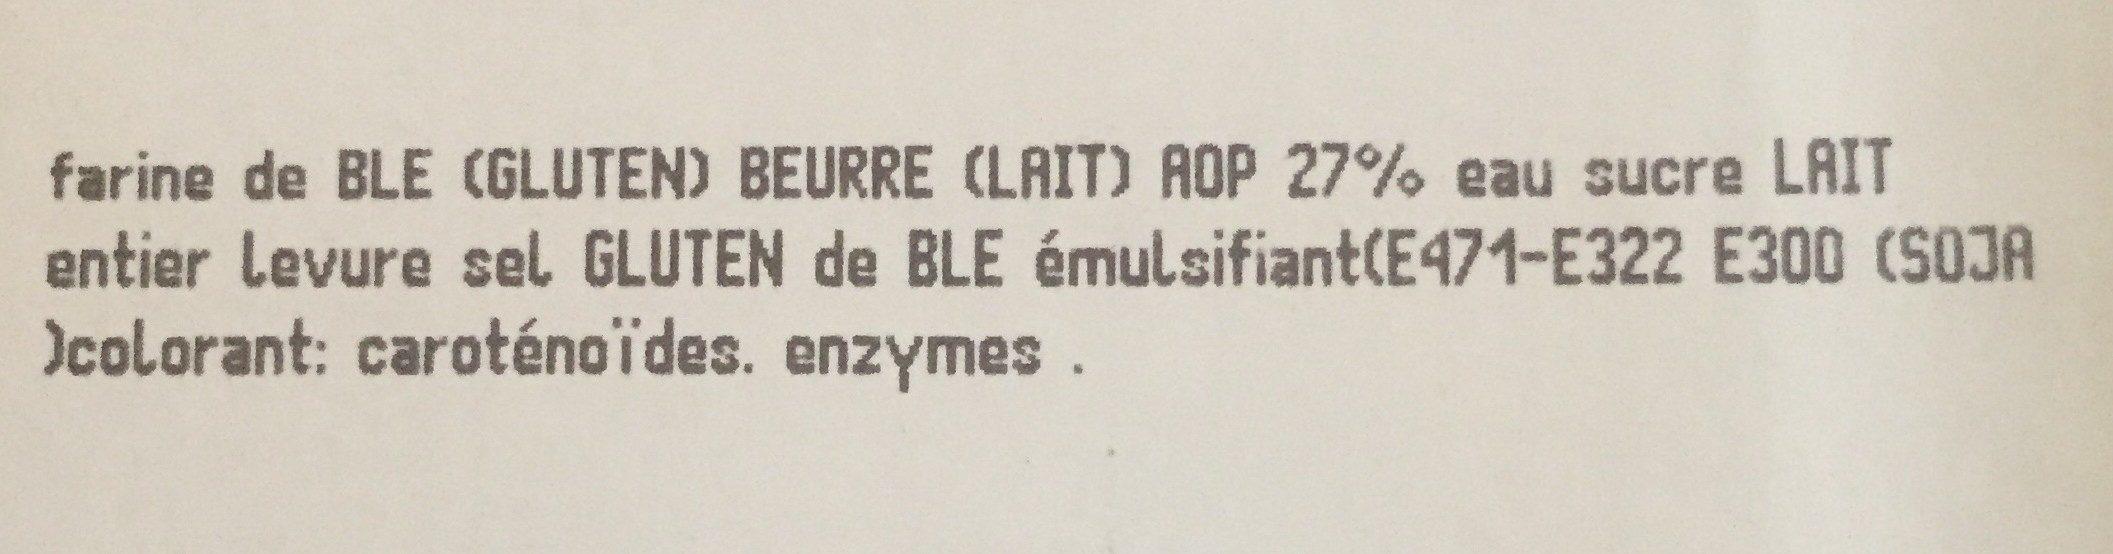 Croissant courbe beurre - Ingrediënten